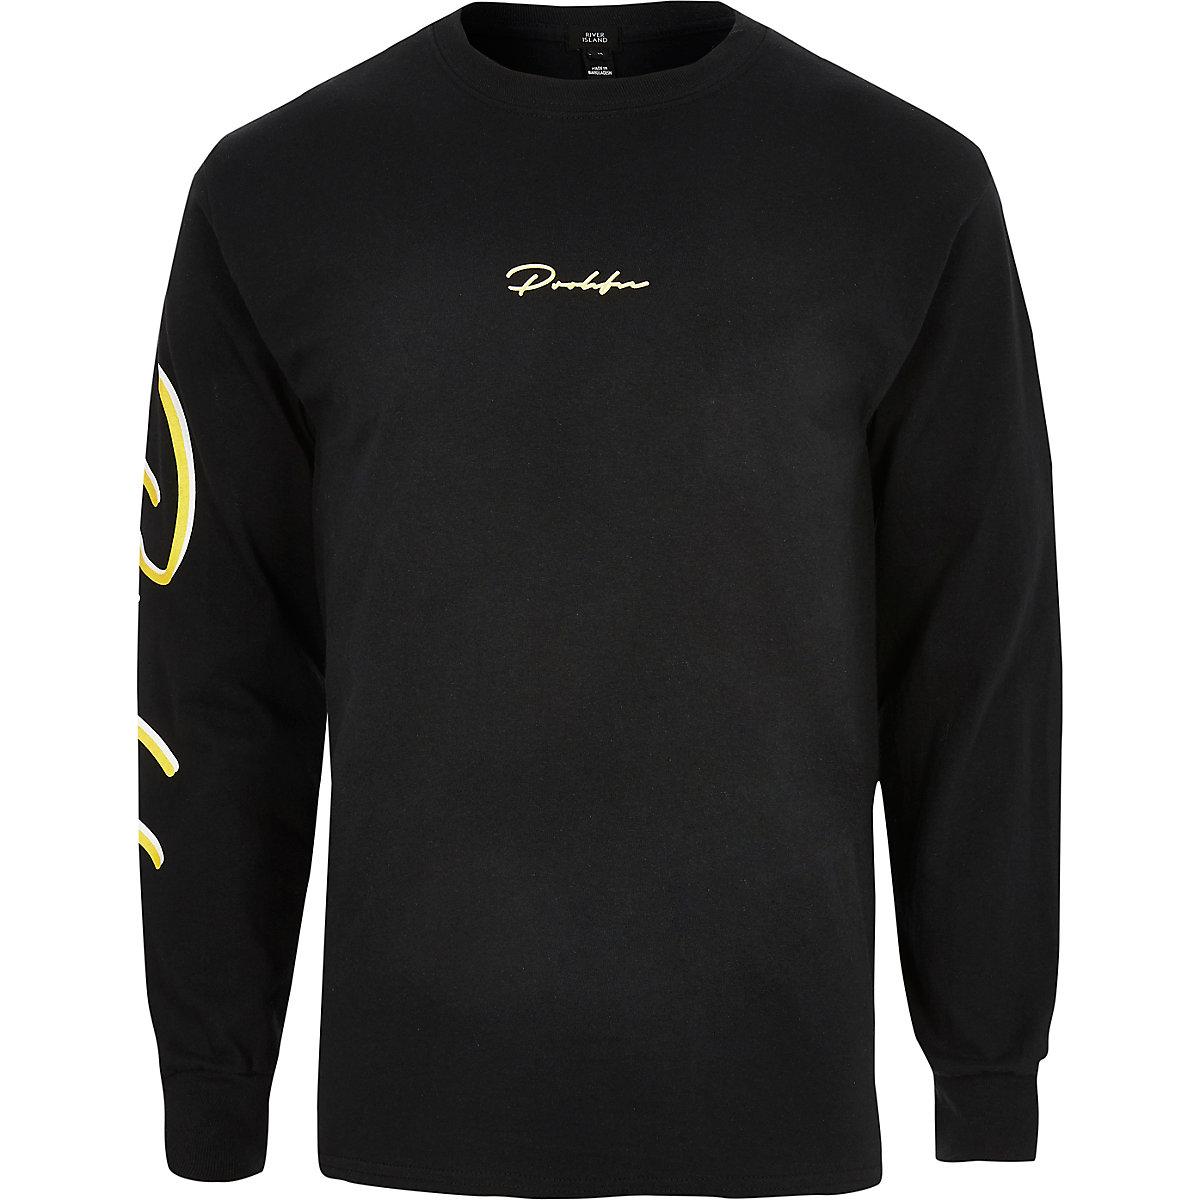 Black 'Prolific' long sleeve T-shirt